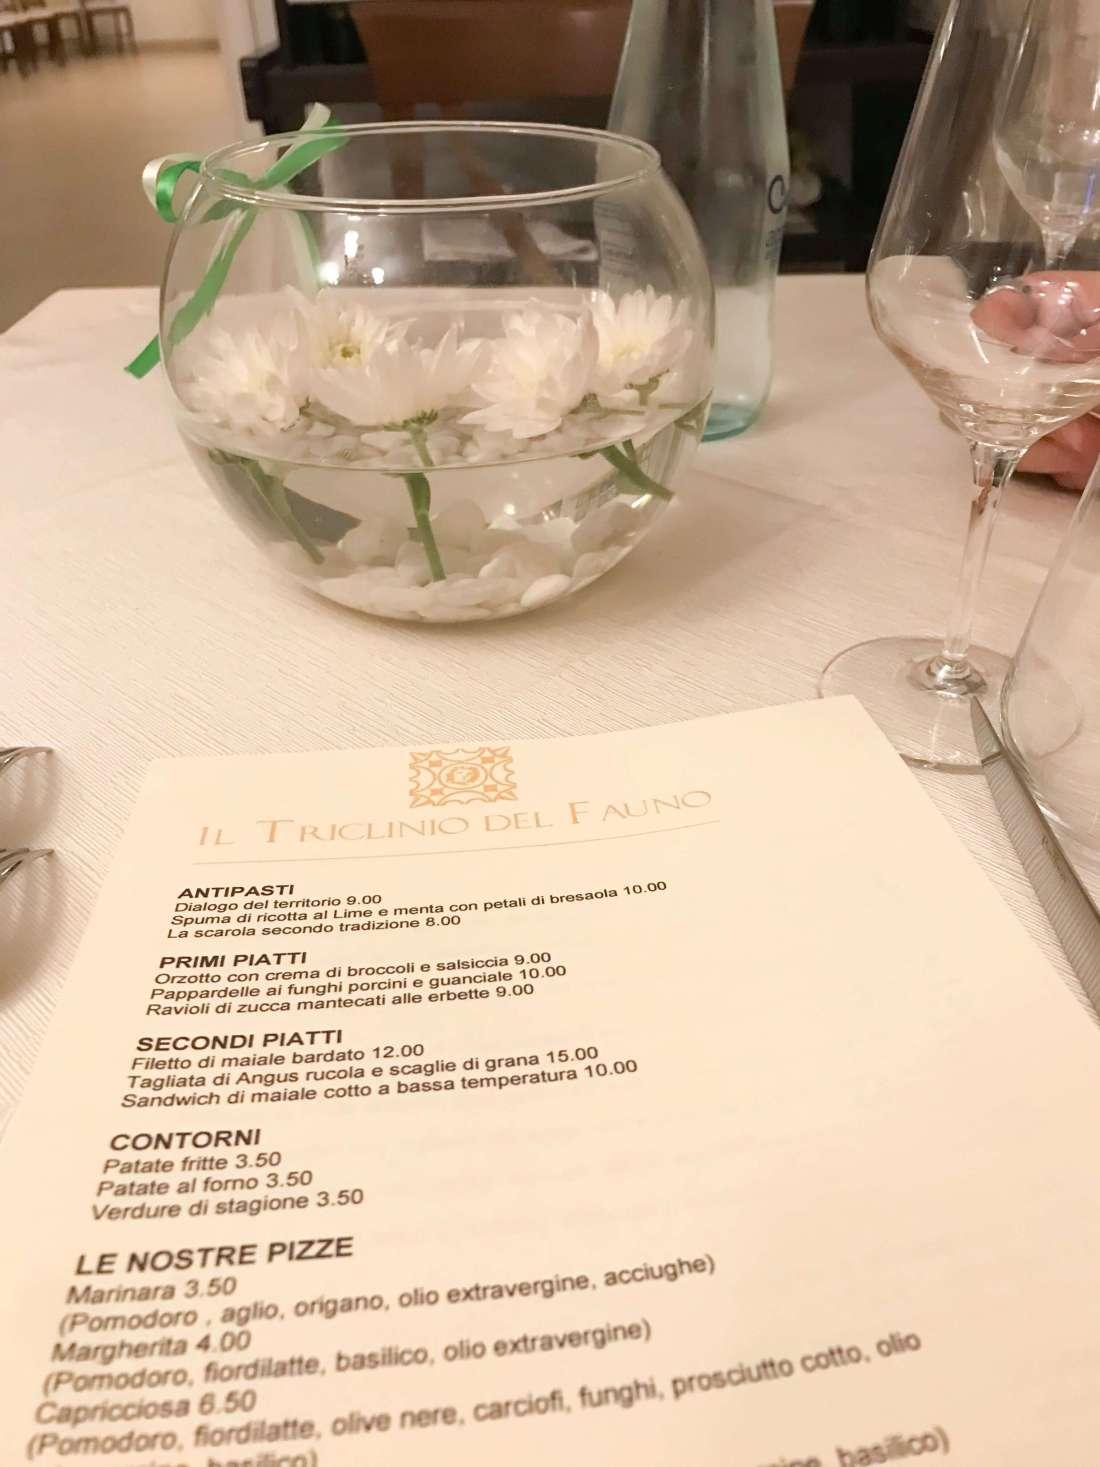 week end relax Il triclinio del fauno menu-min